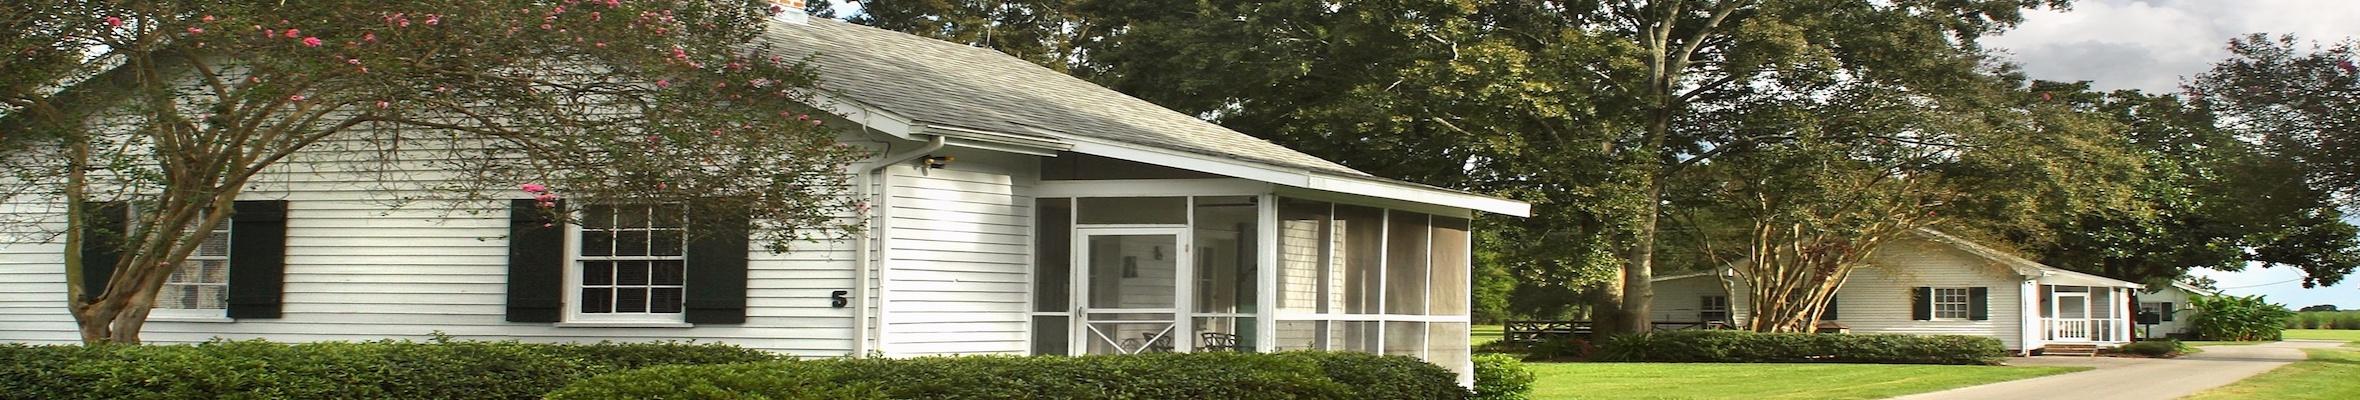 Cottage 5A & 5B